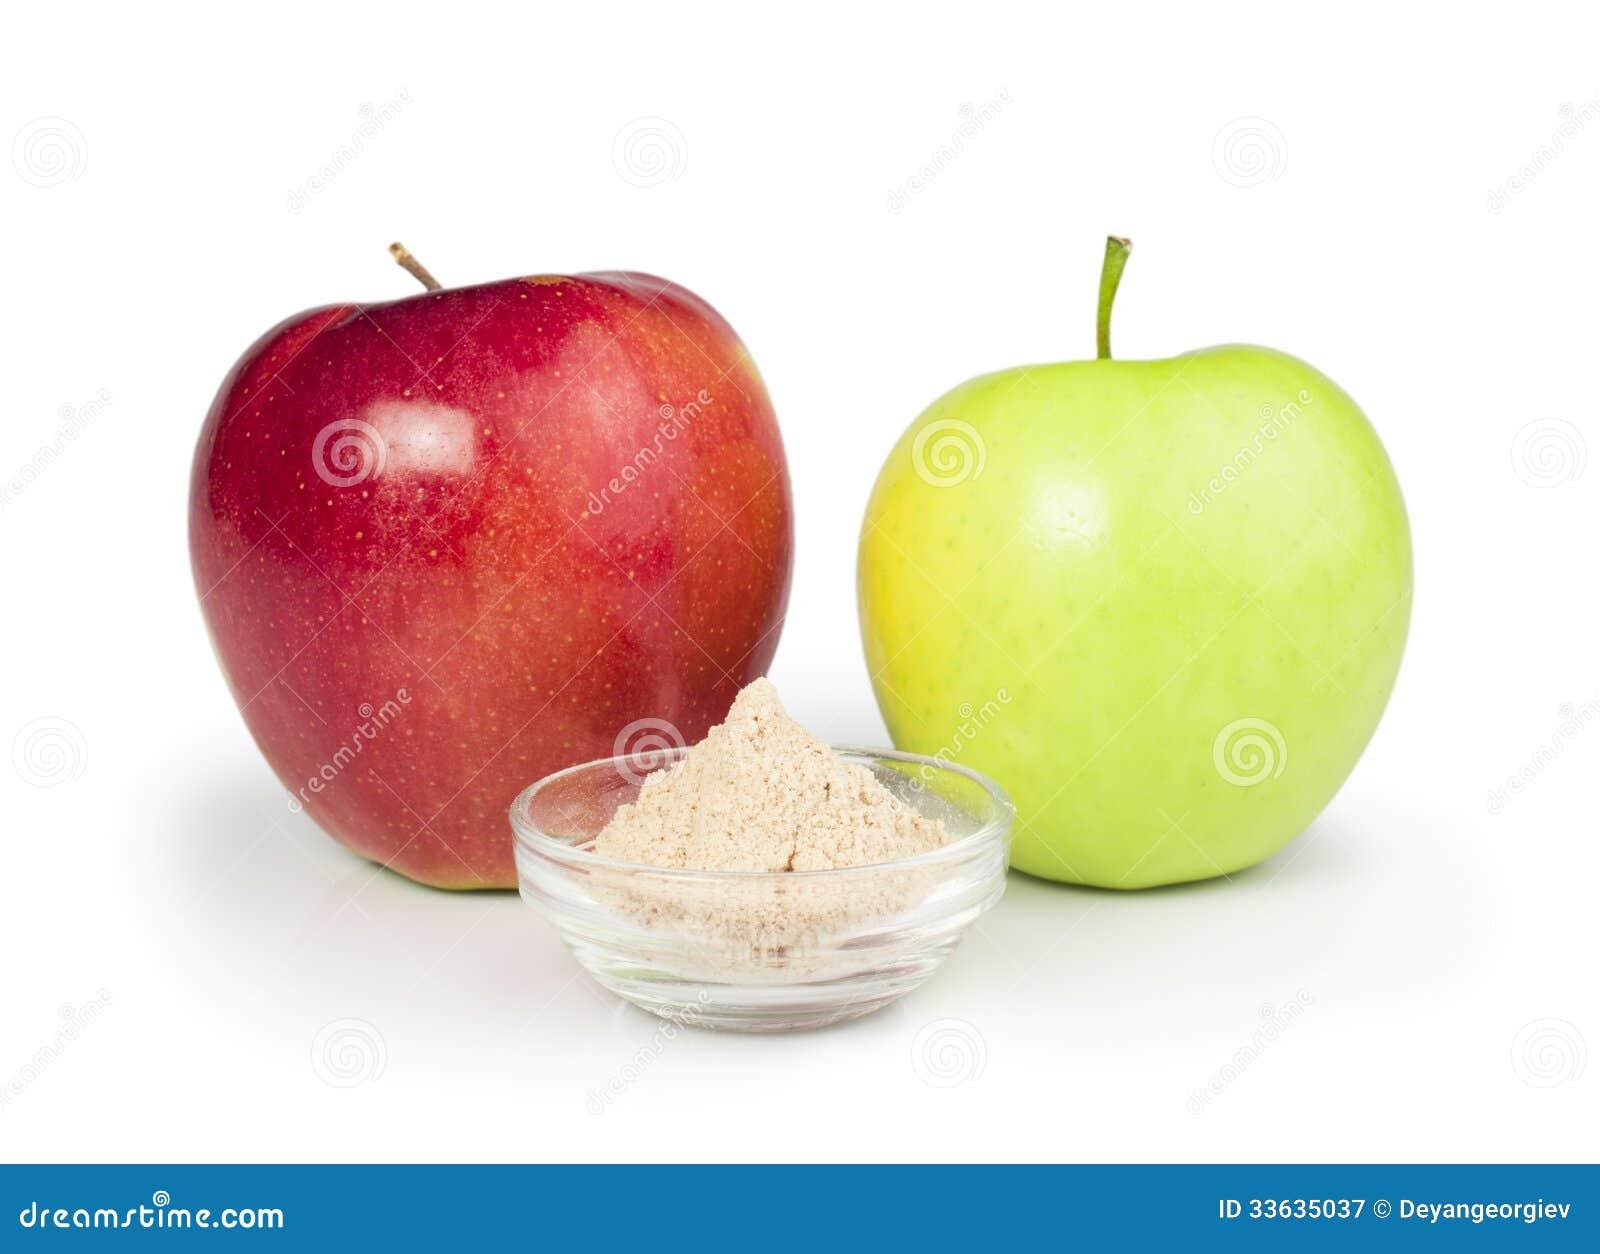 Pectin in apples